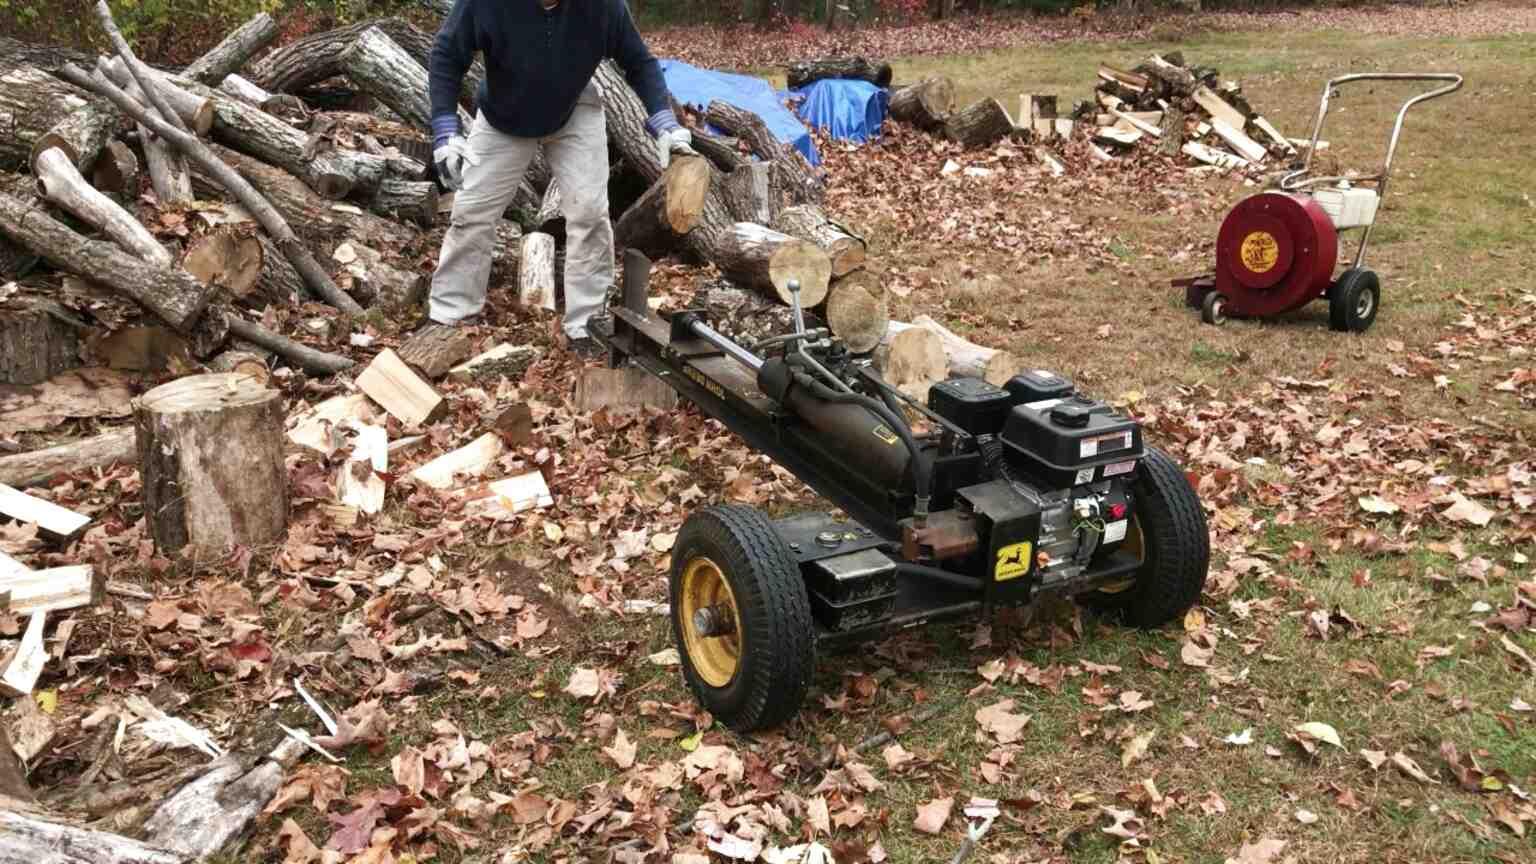 Log Splitter Deere for sale   Only 4 left at -60%